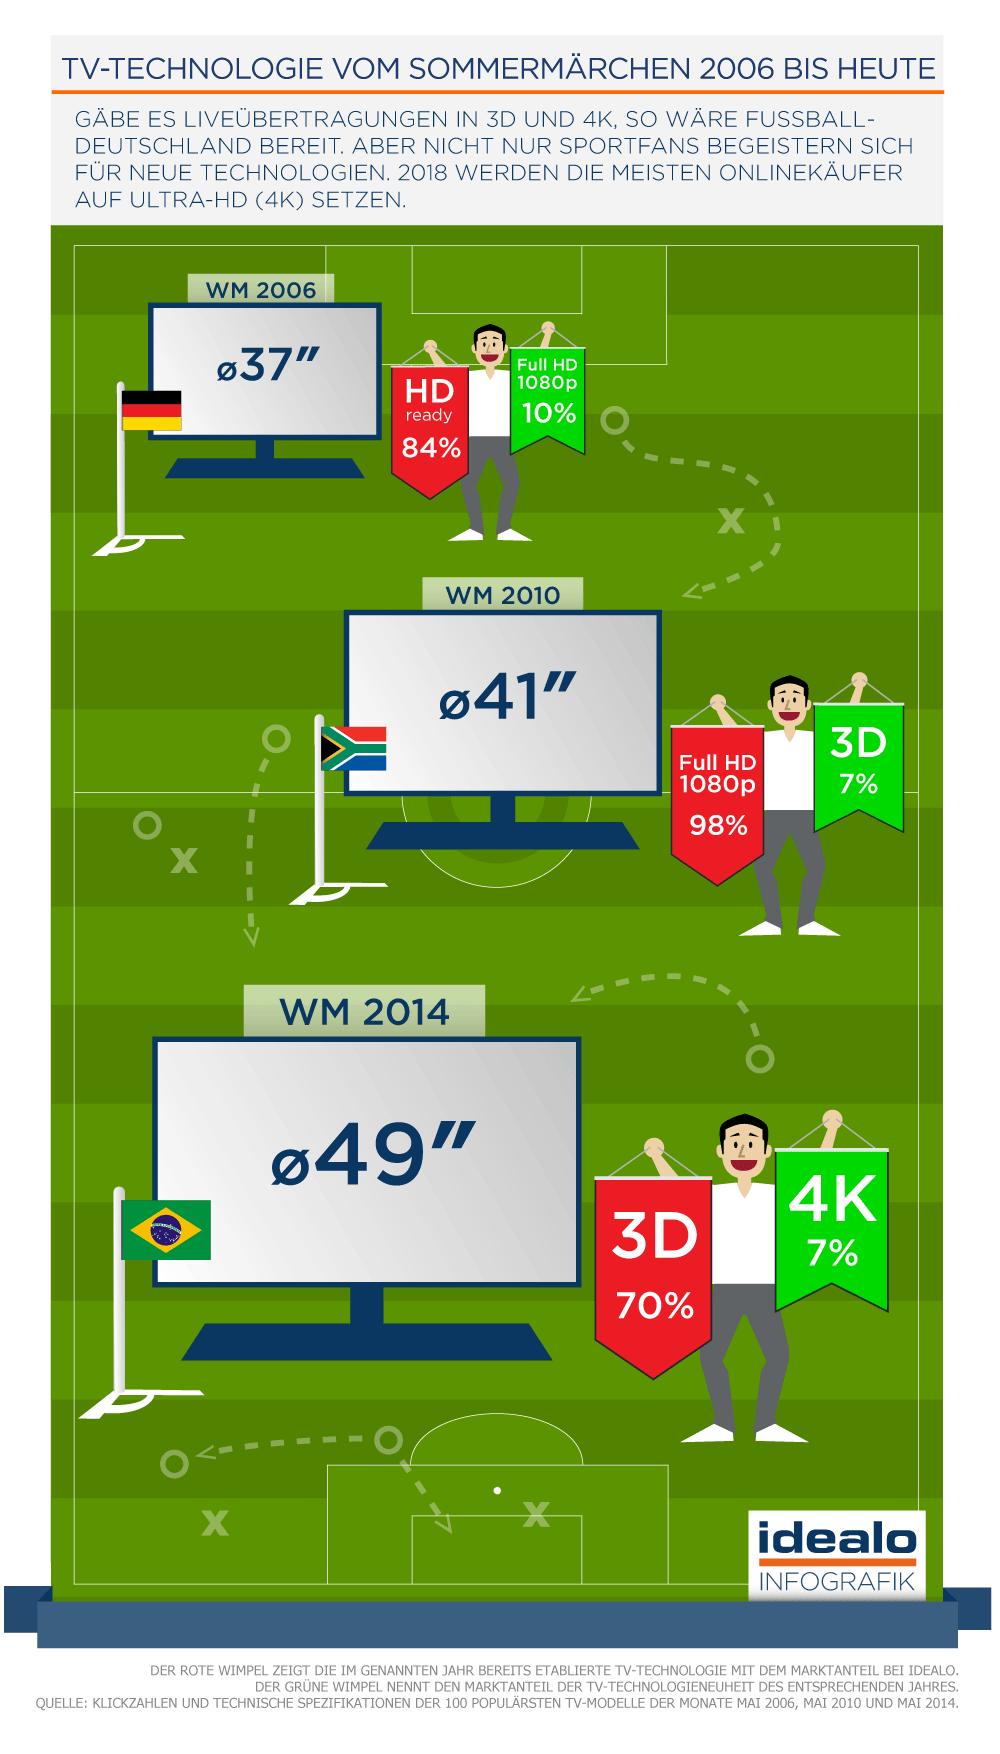 Idealo Infografik WM 2006 bis 2014